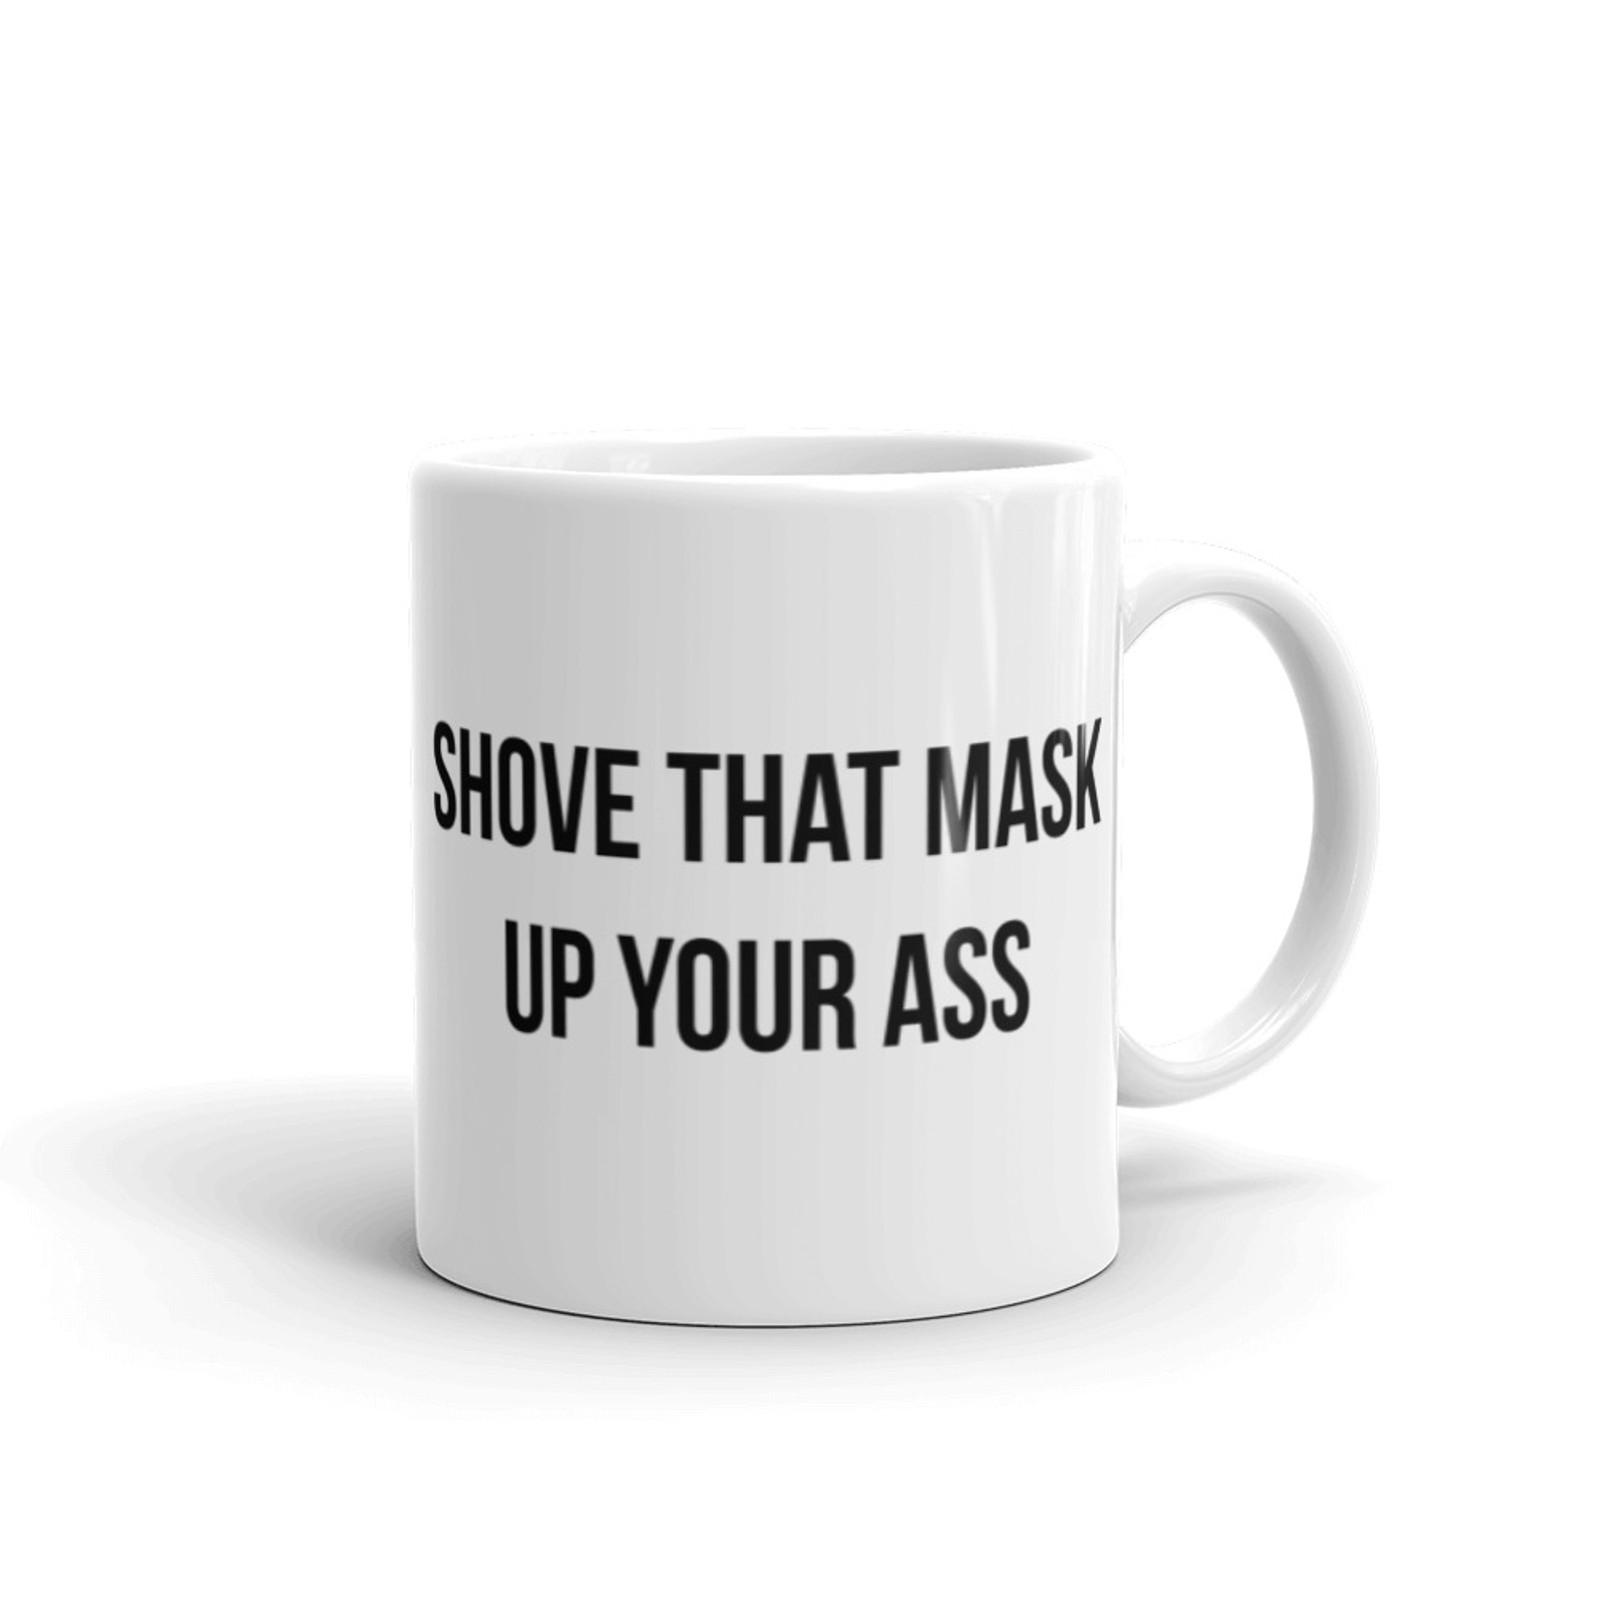 Shove That Mask Mug